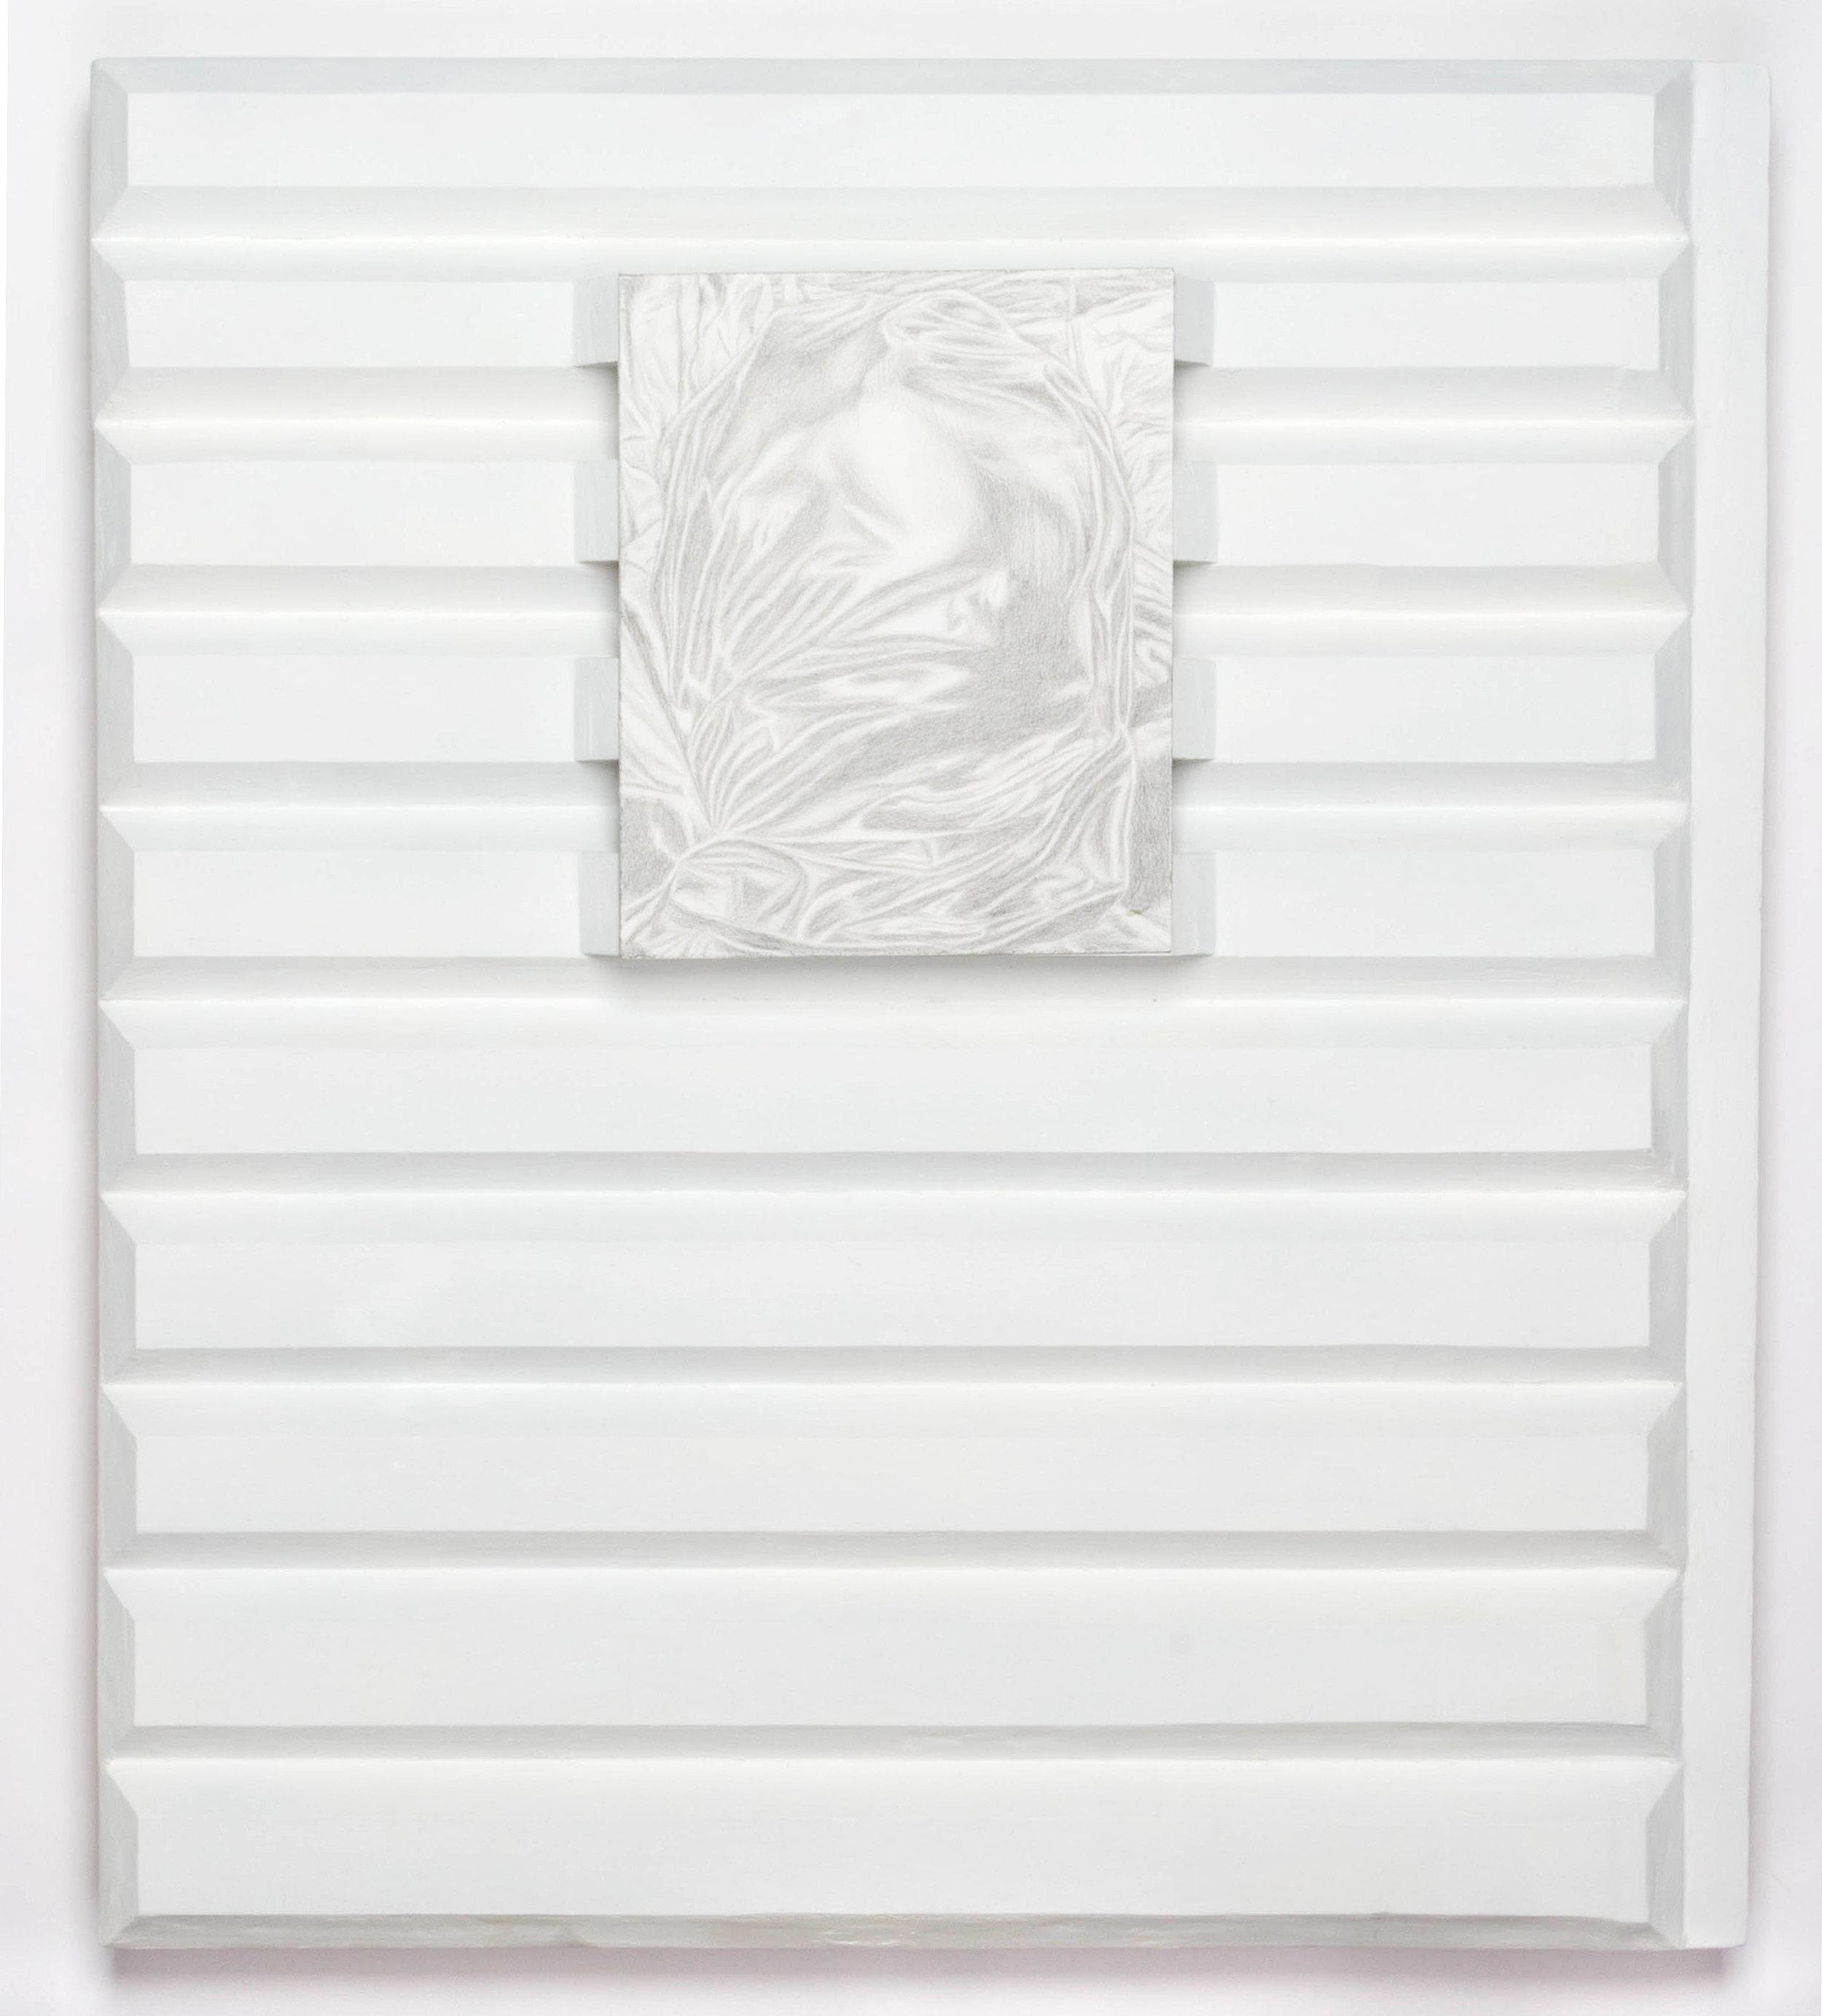 Untitled (F001)